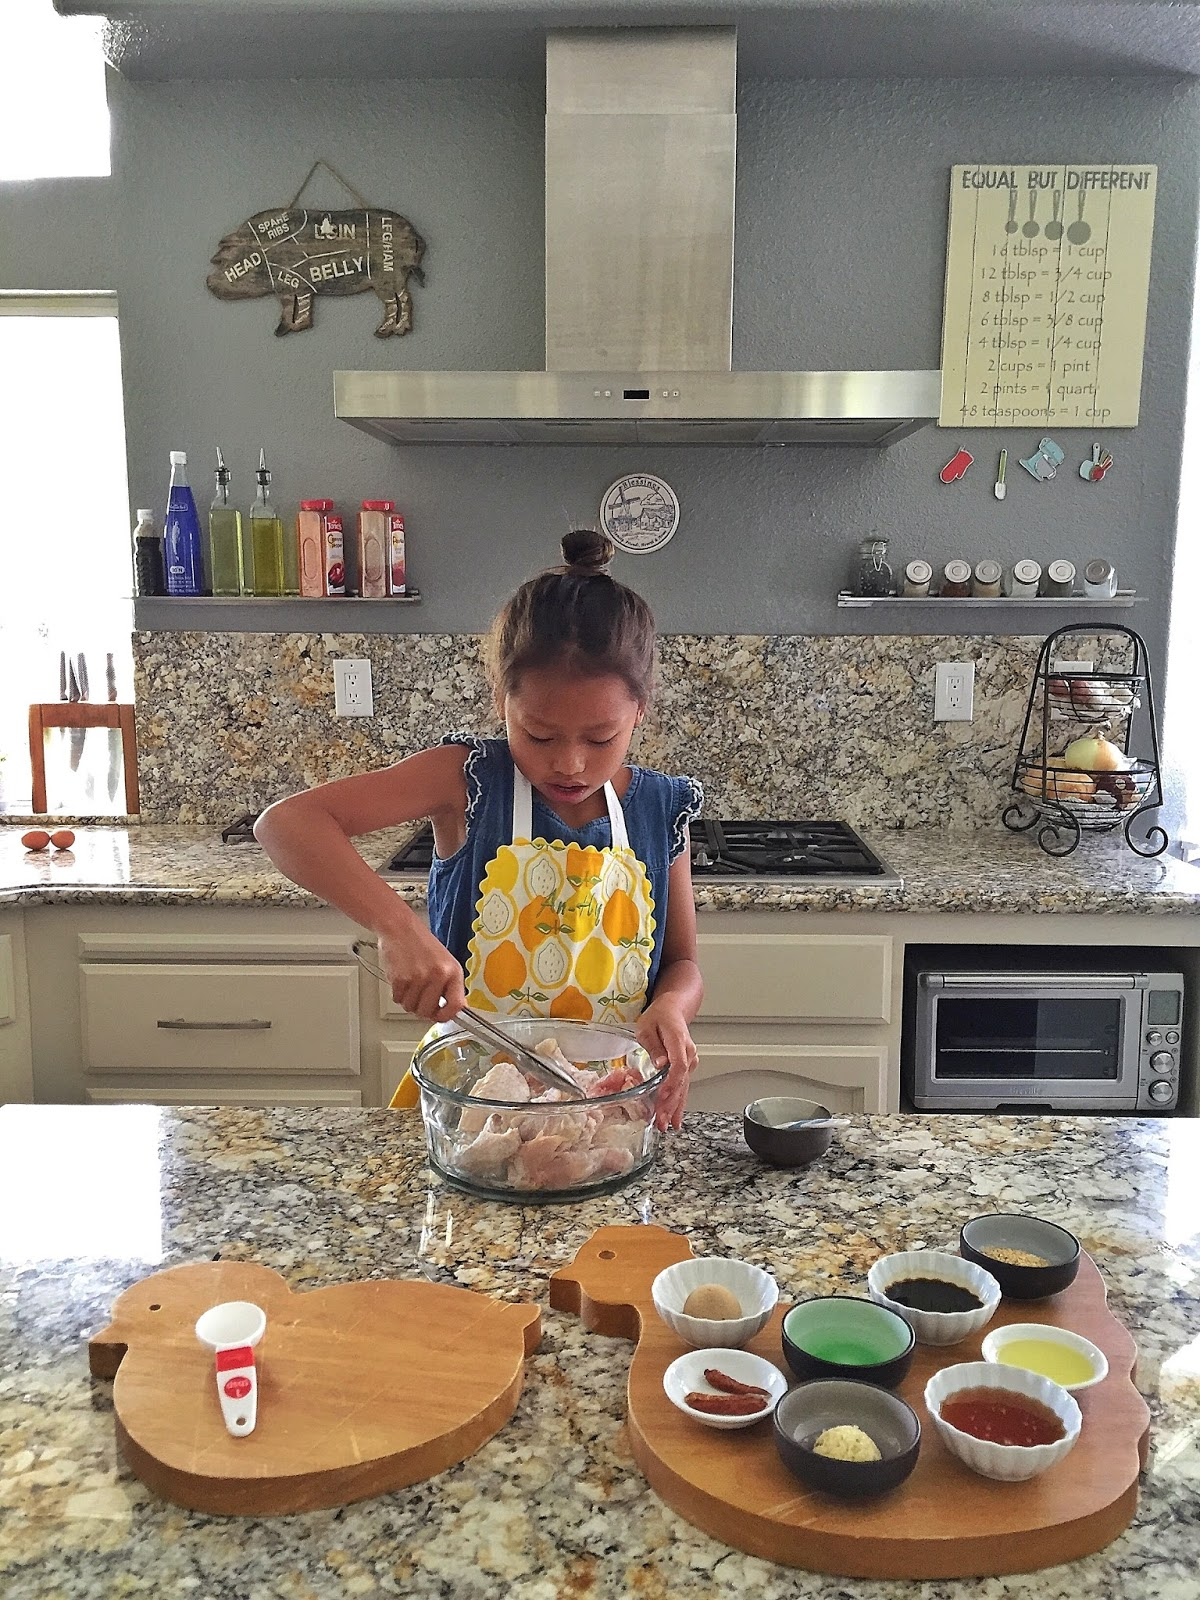 The Spices Of Life C 225 Nh G 224 Nướng Gi 242 N Crispy Oven